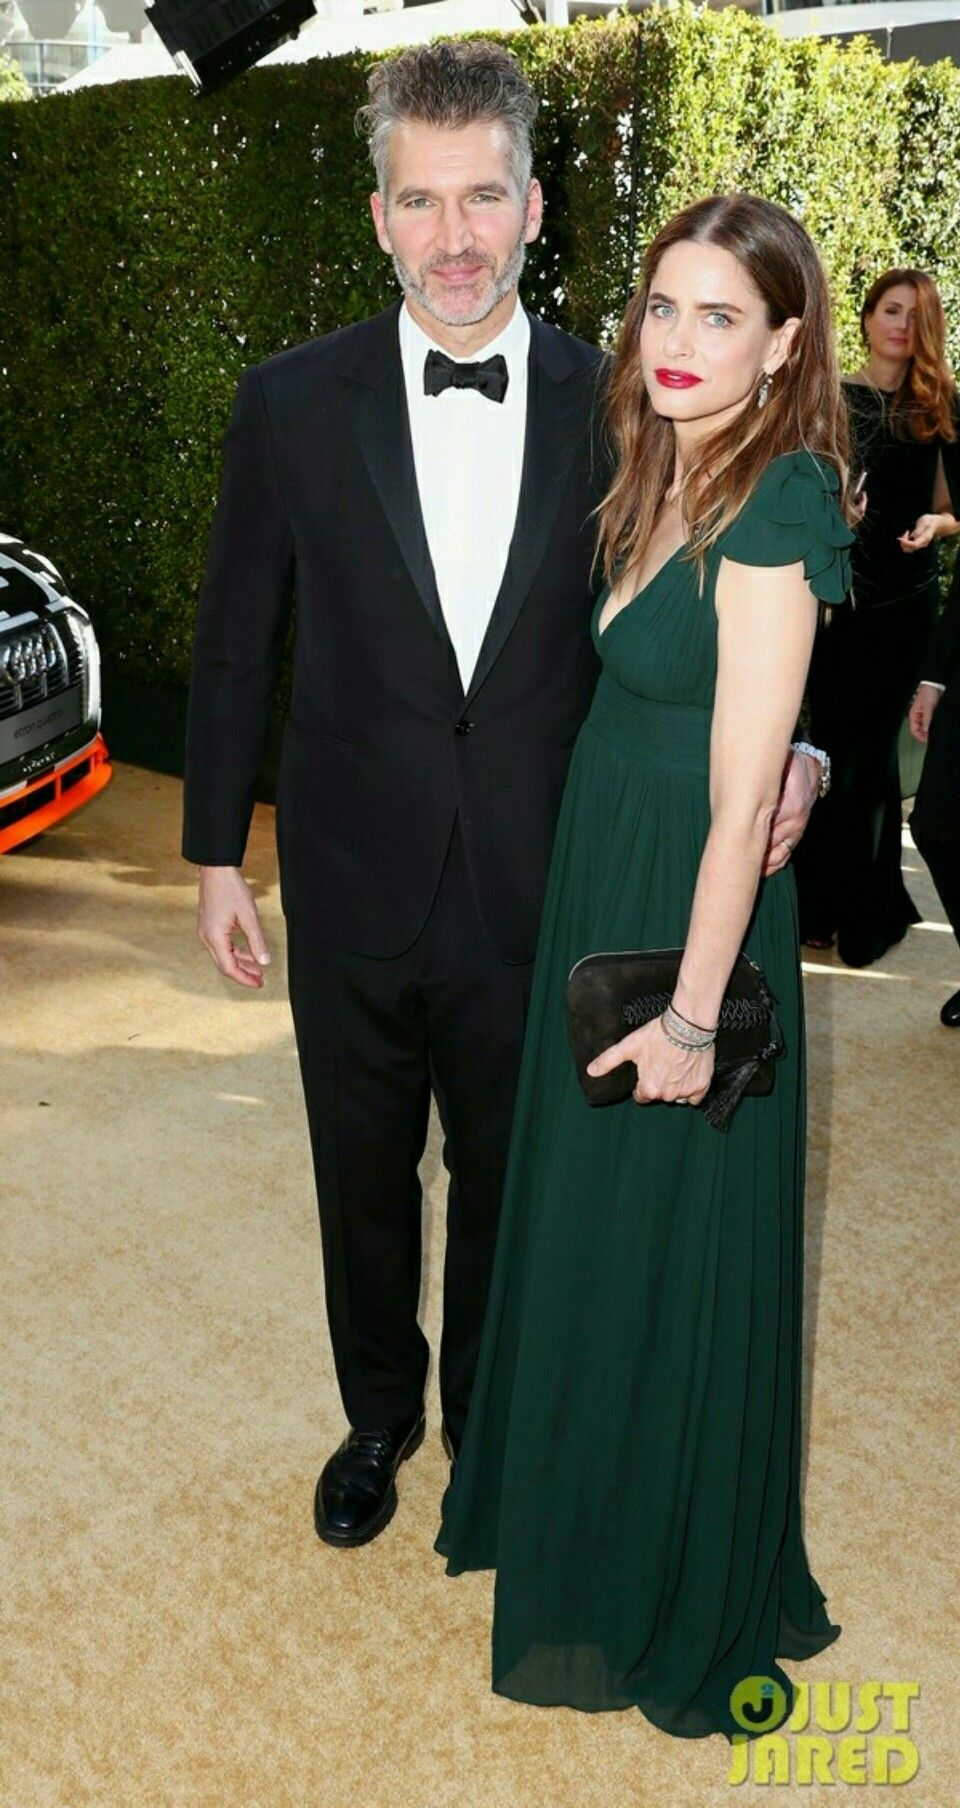 Amanda peet and husband. Amanda Peet - Wikipedia